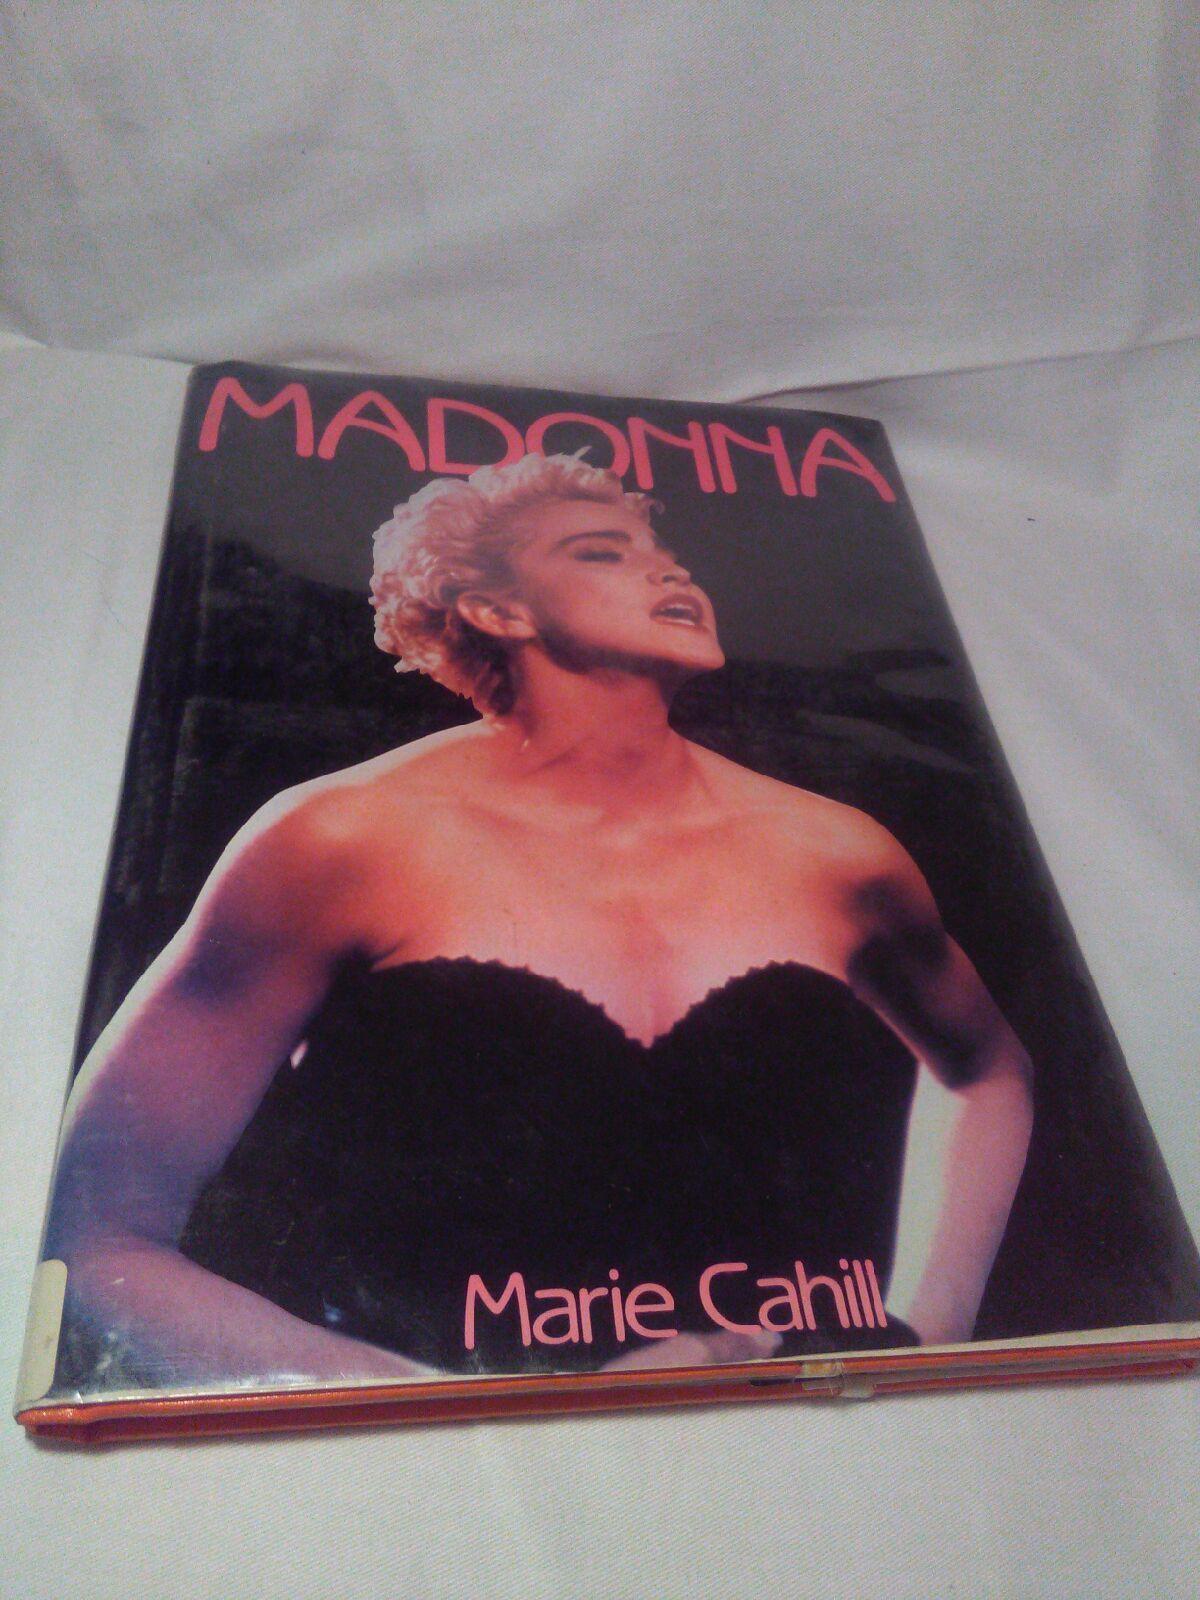 Madonna book large coffee table hardback Mercari BUY & SELL